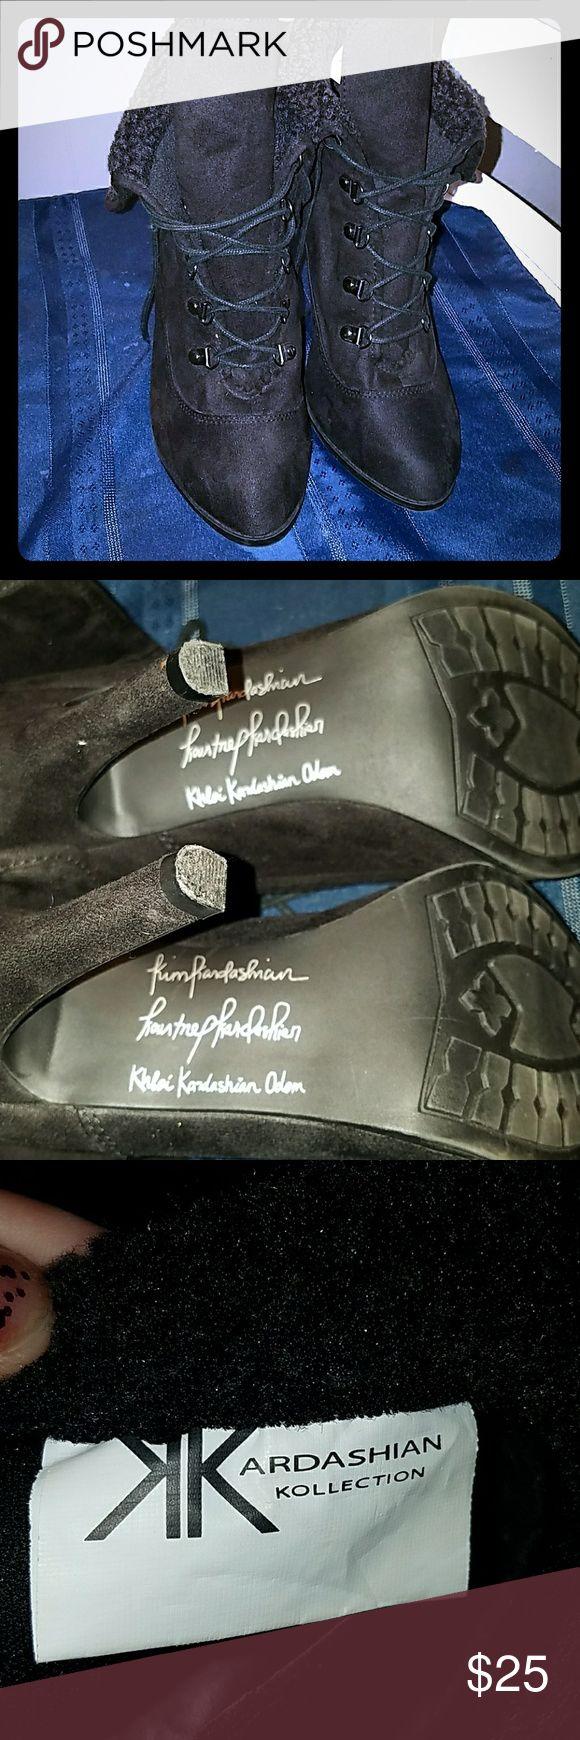 Kardashian Kollection Sexy Flirty Black heeled boots. 10M Never Worn!! Shoes Heeled Boots